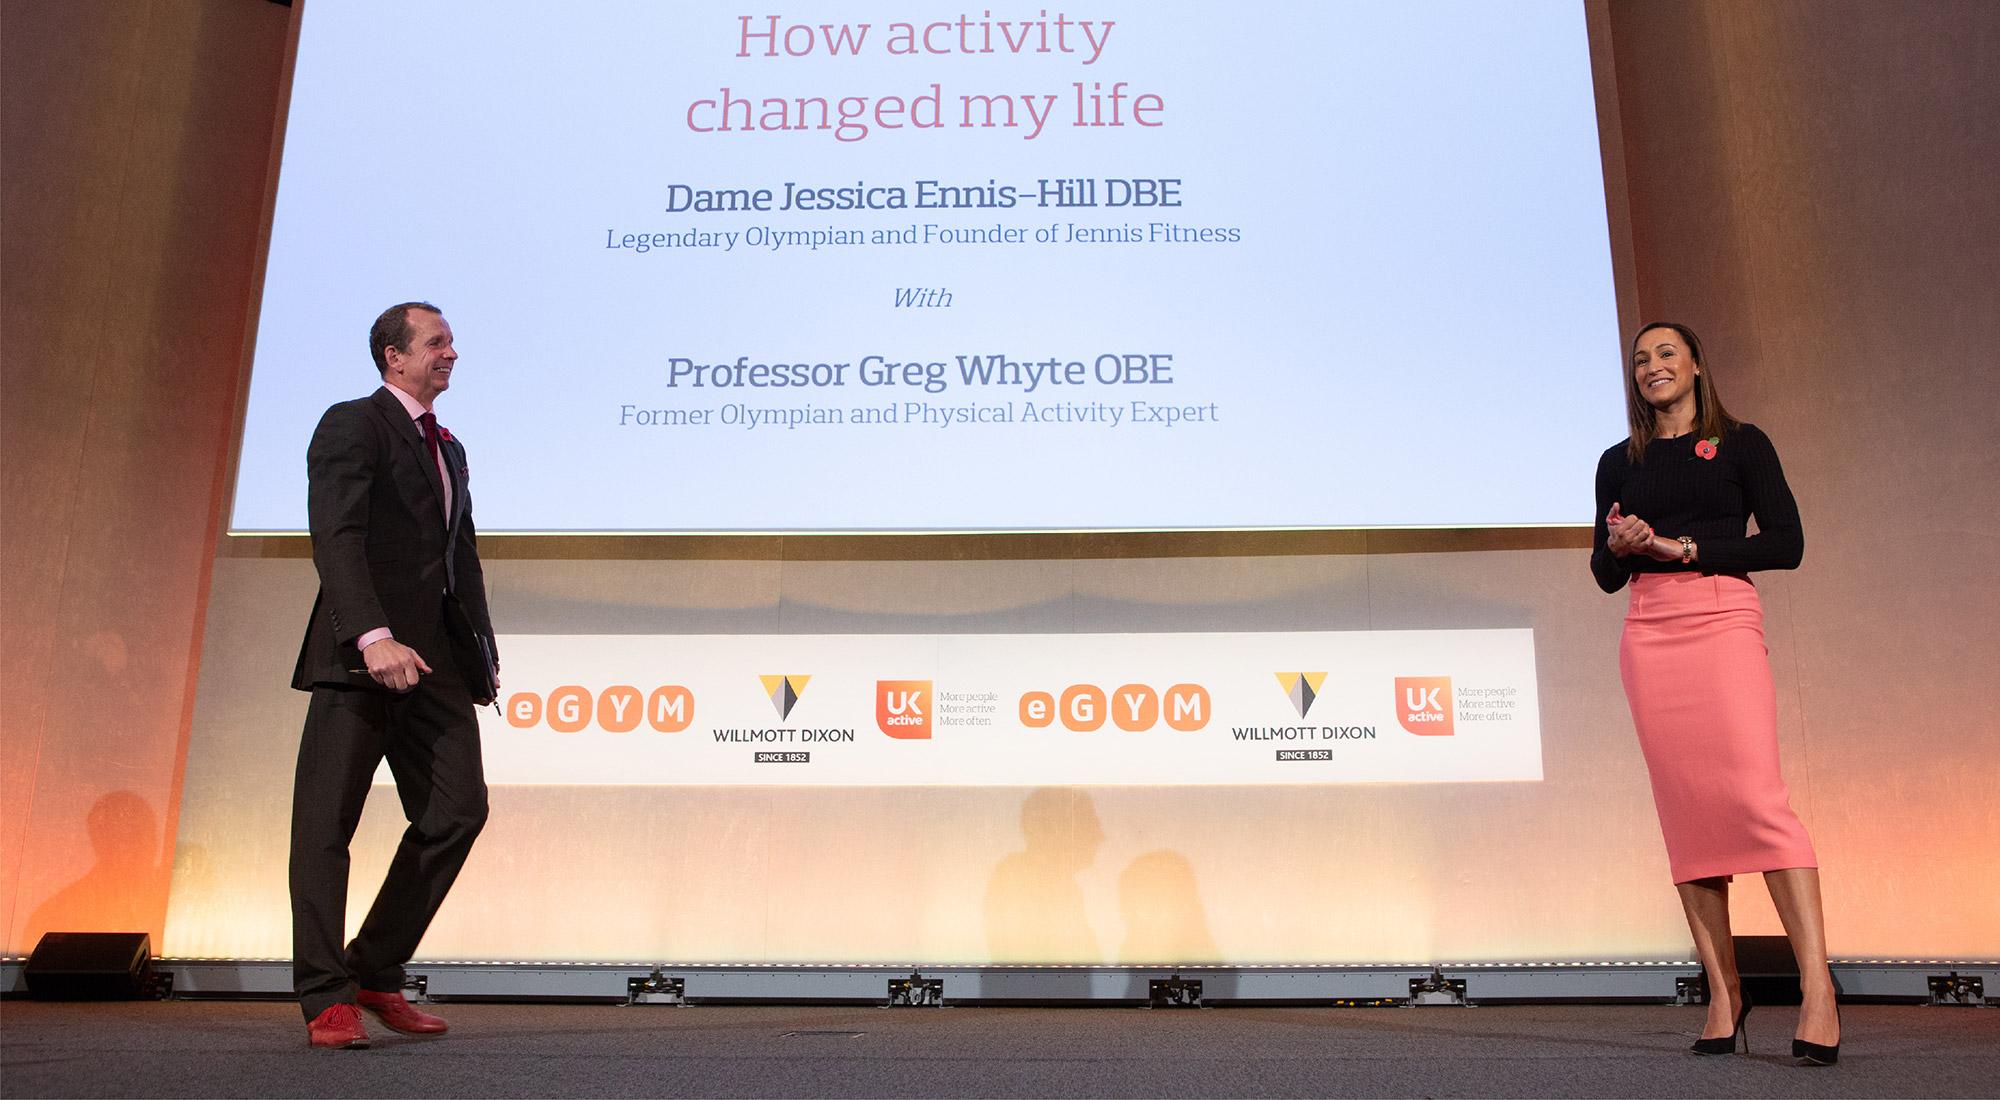 Professor Greg Whyte OBE joins ukactive Board of Directors